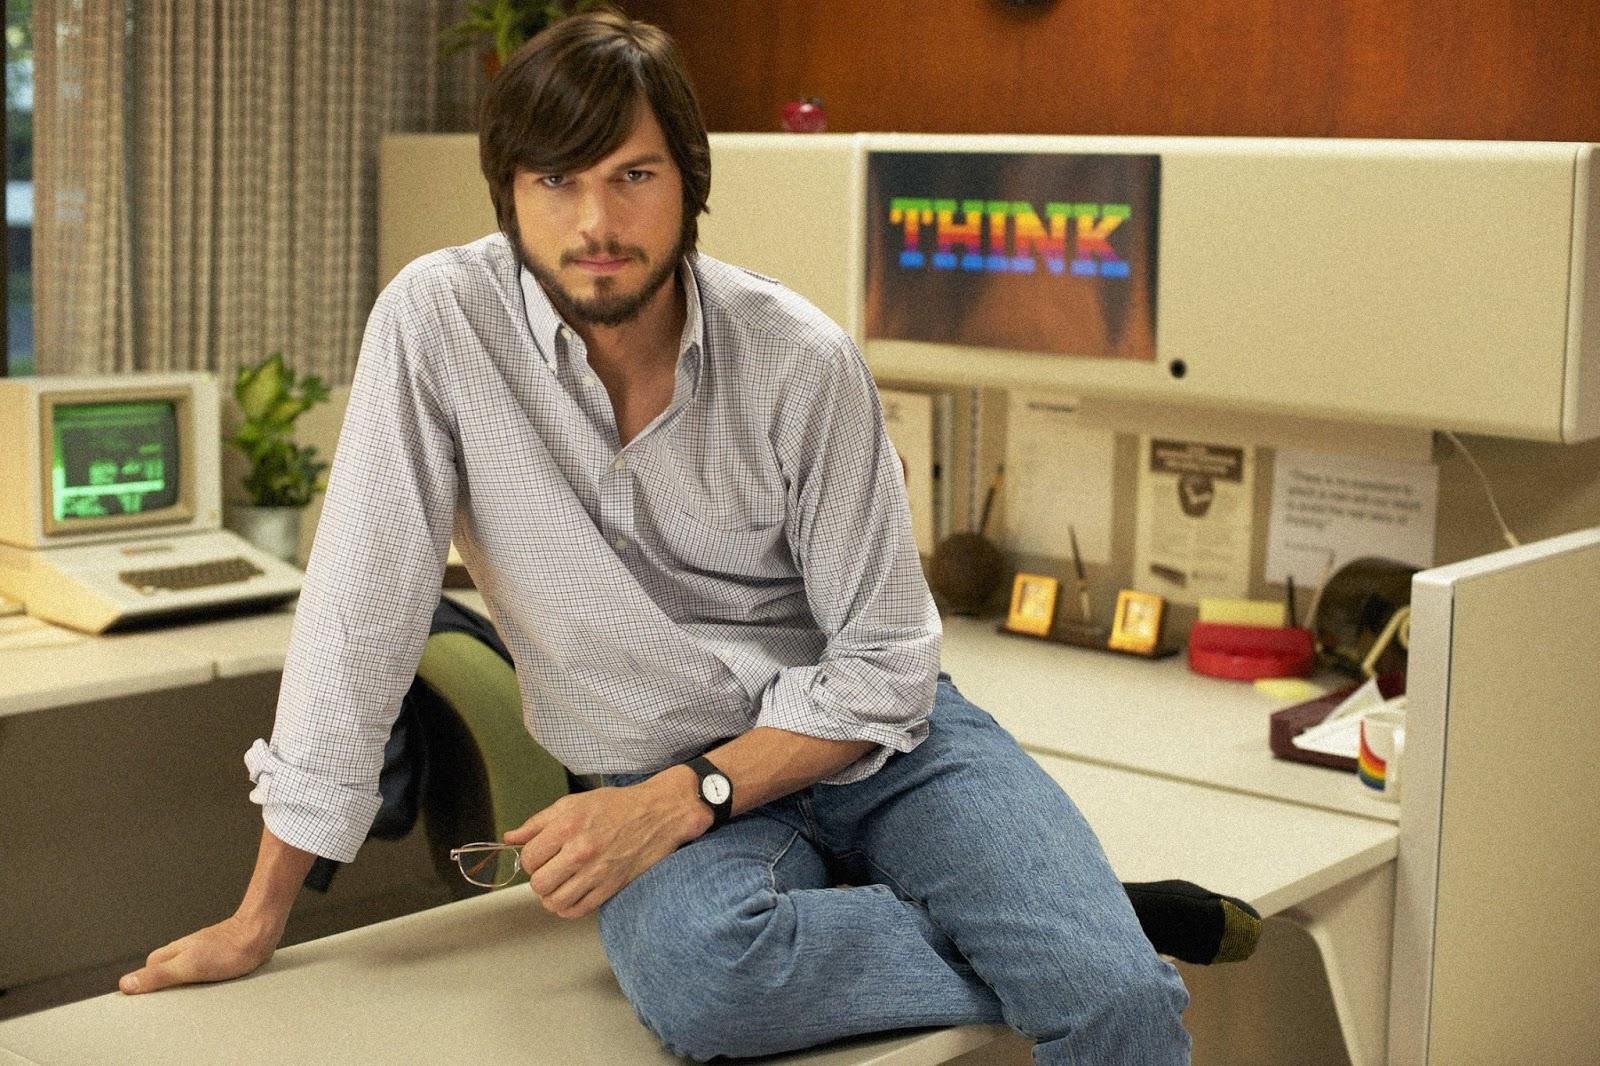 http://2.bp.blogspot.com/-jBANoPSaWXQ/UUTnKeeXxXI/AAAAAAAAAz4/eRaGtG7Wj3w/s1600/ashton-kutcher-as-steve-jobs.jpg